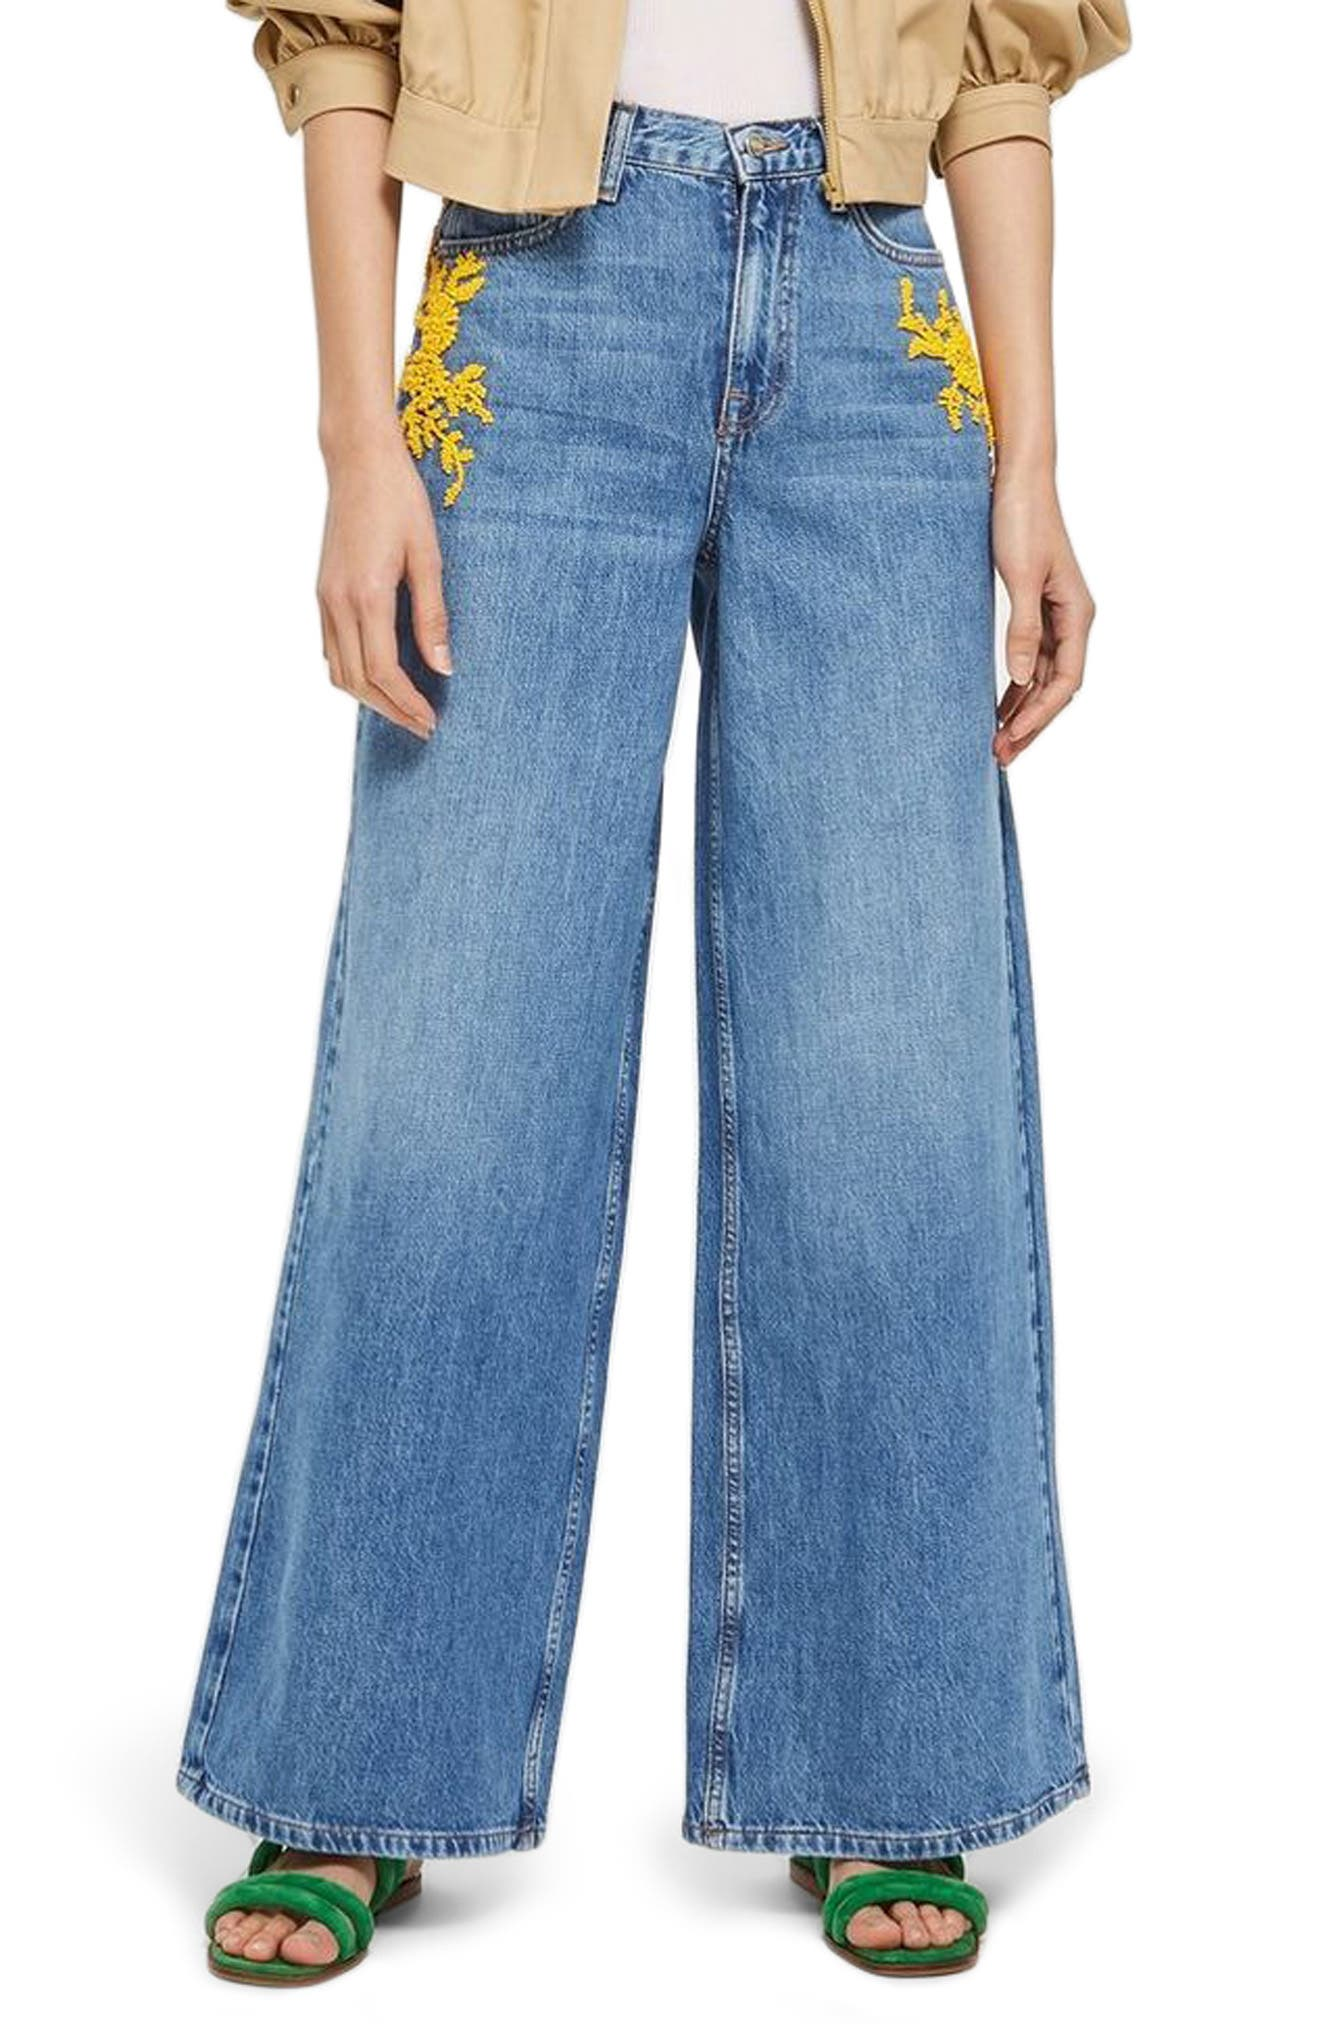 MOTO Bead Detail Wide Leg Non-Stretch Jeans,                             Main thumbnail 1, color,                             Mid Denim